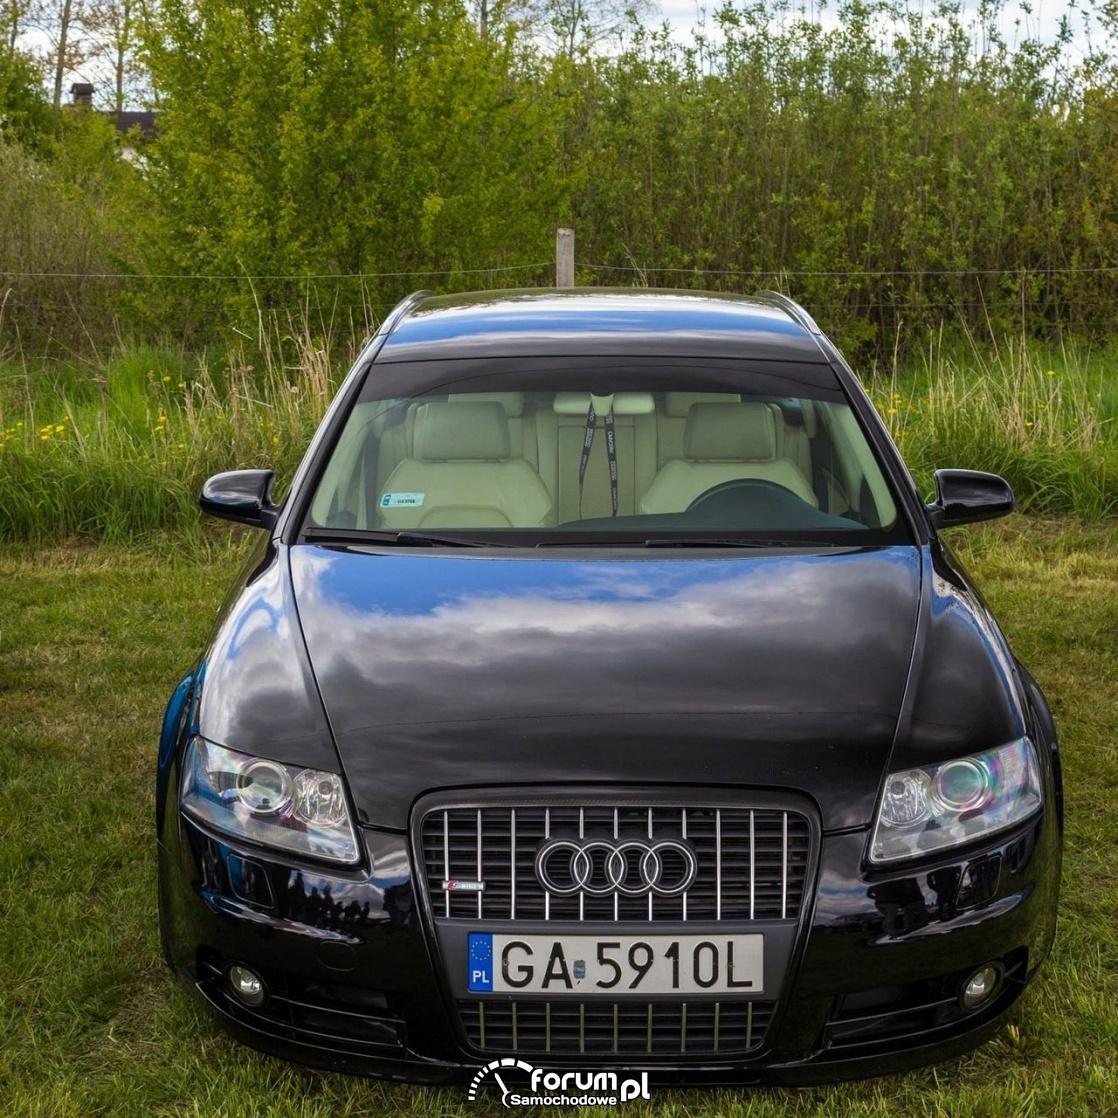 Nowy Staw 2014, Audi A6